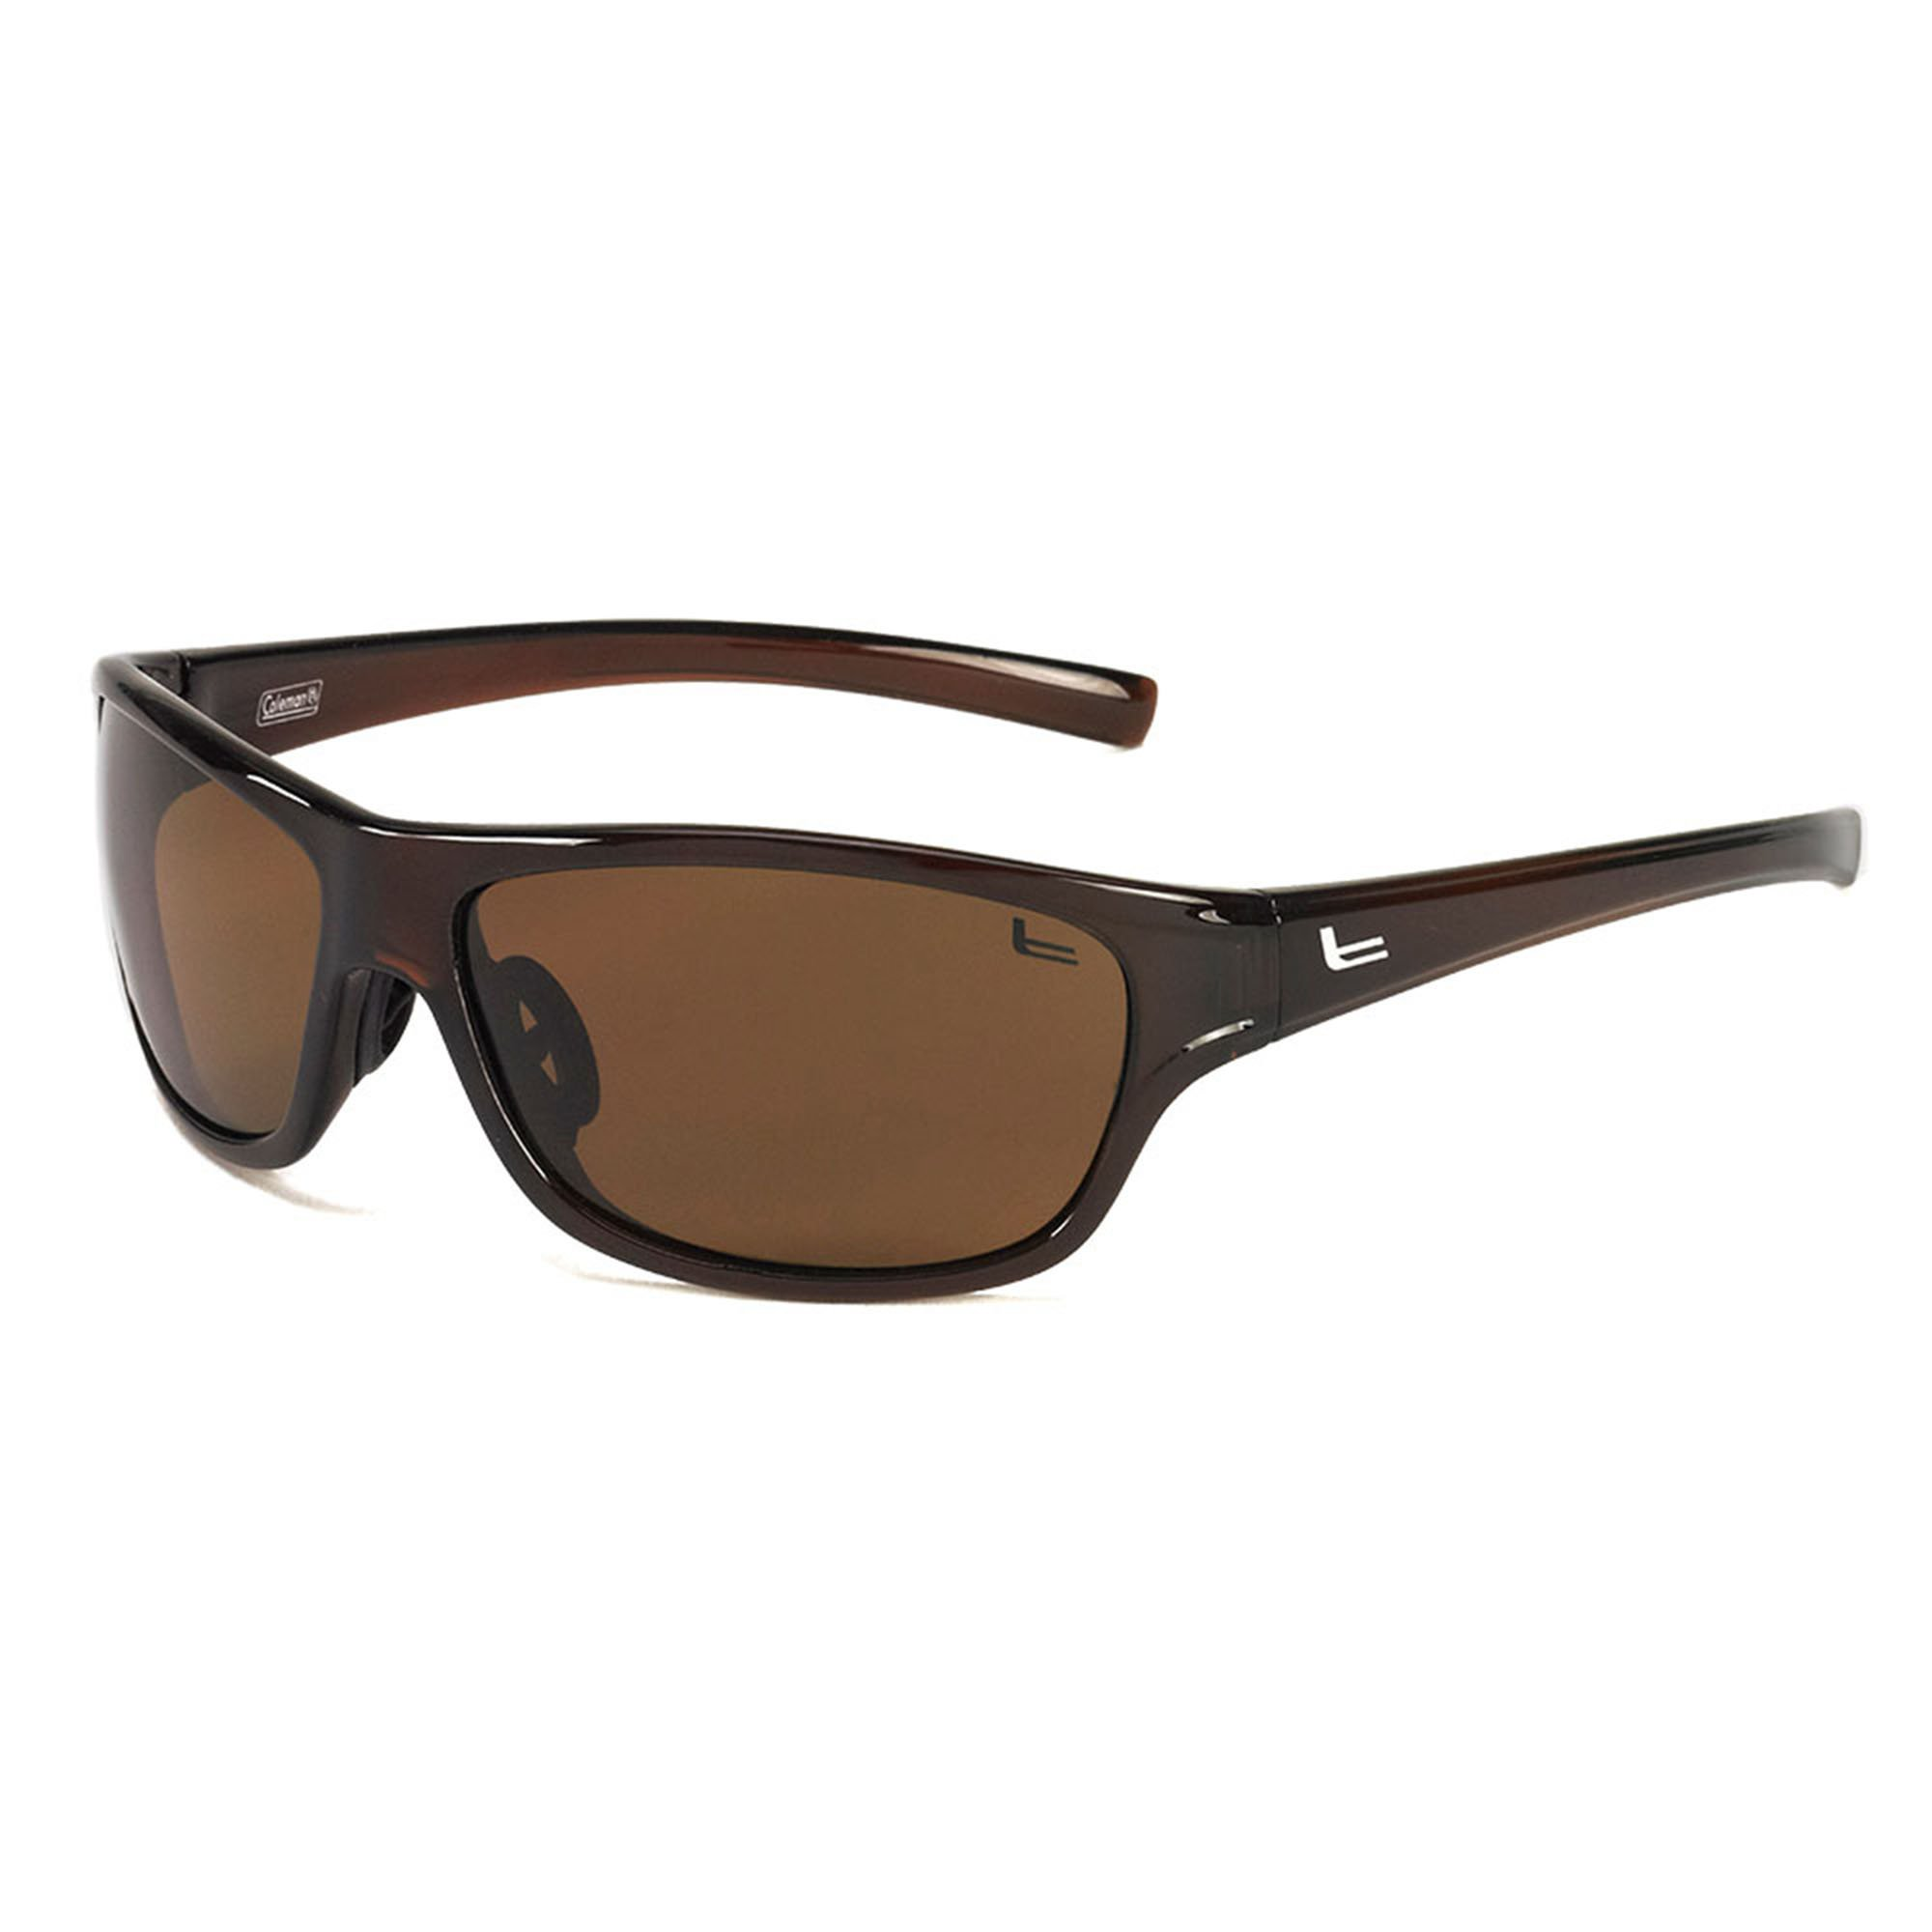 Oculos de Sol Coleman Polarizado - C6038C2 - Invicta 4d4ff91094